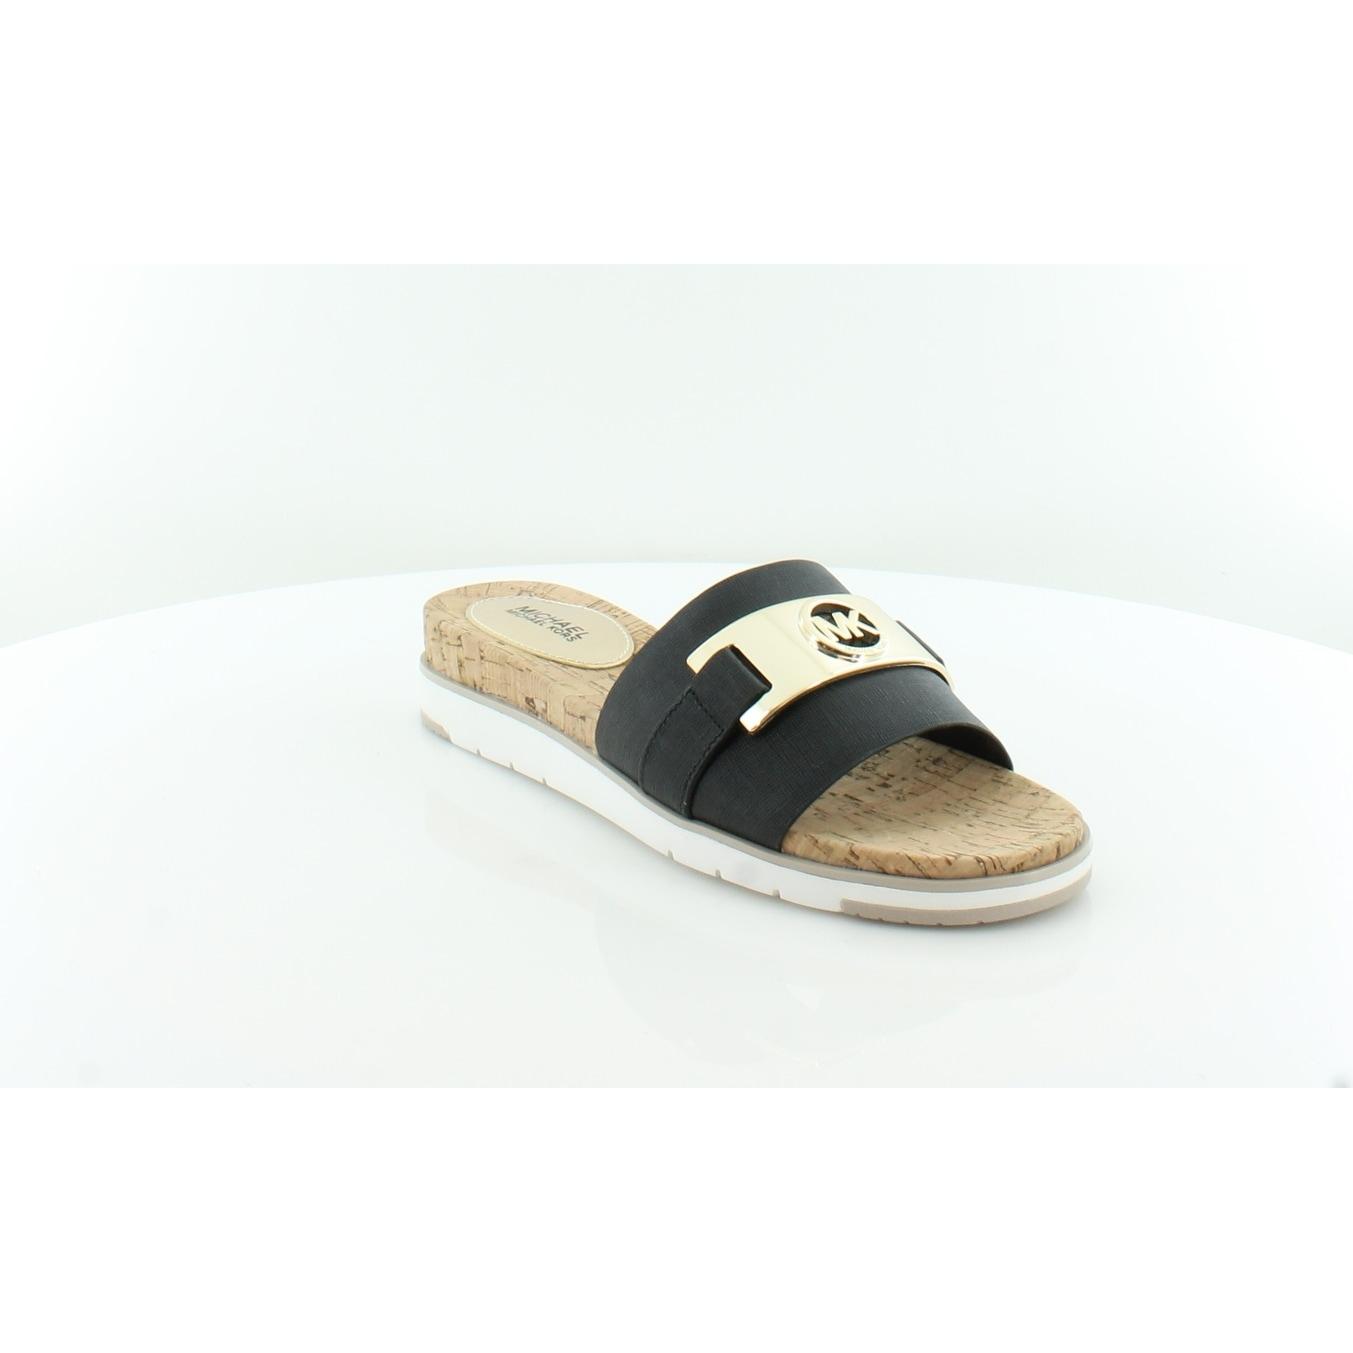 c9ec8a02c371 Shop Michael Kors Warren Slide Flat Sandal Women s Sandals   Flip Flops  Black - Free Shipping Today - Overstock - 21853123